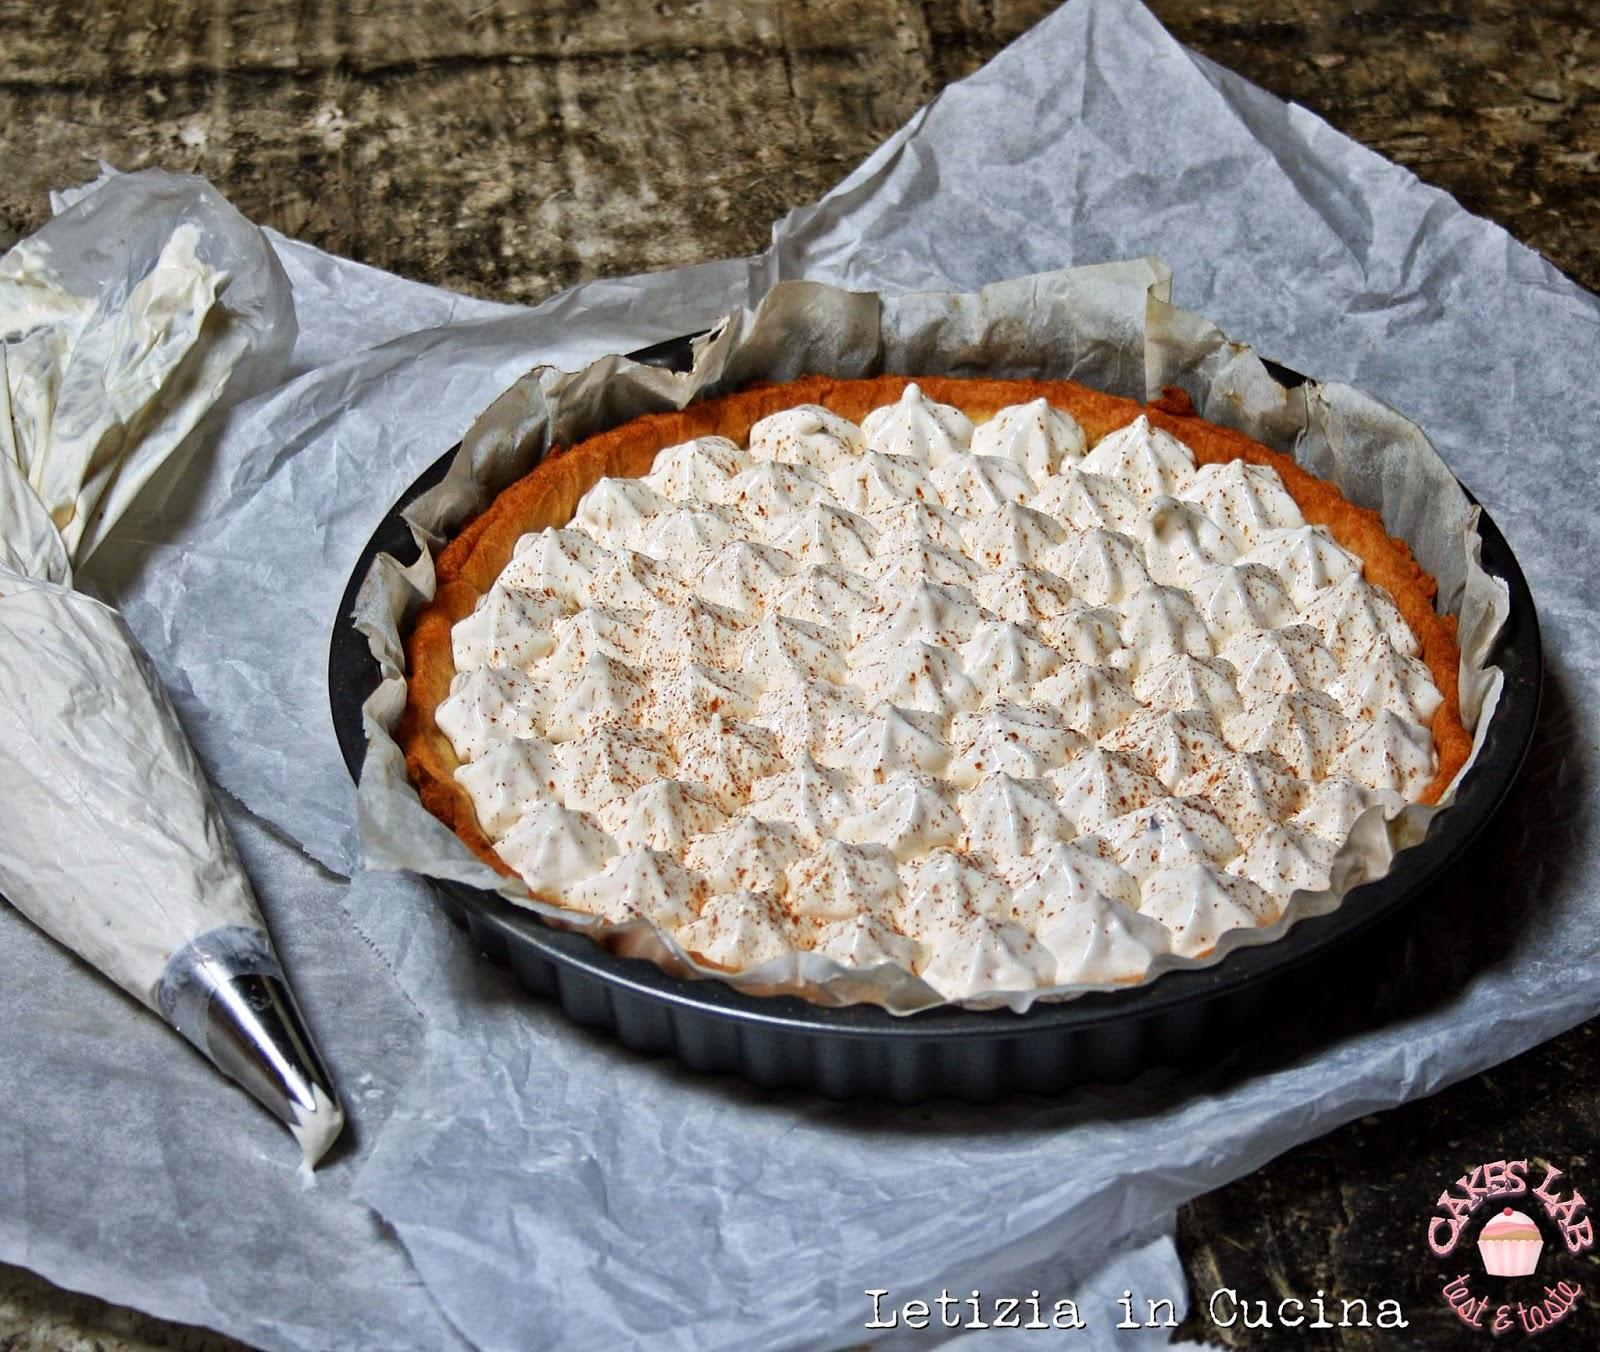 Letizia in Cucina: Torta di Latte - Cakes Lab